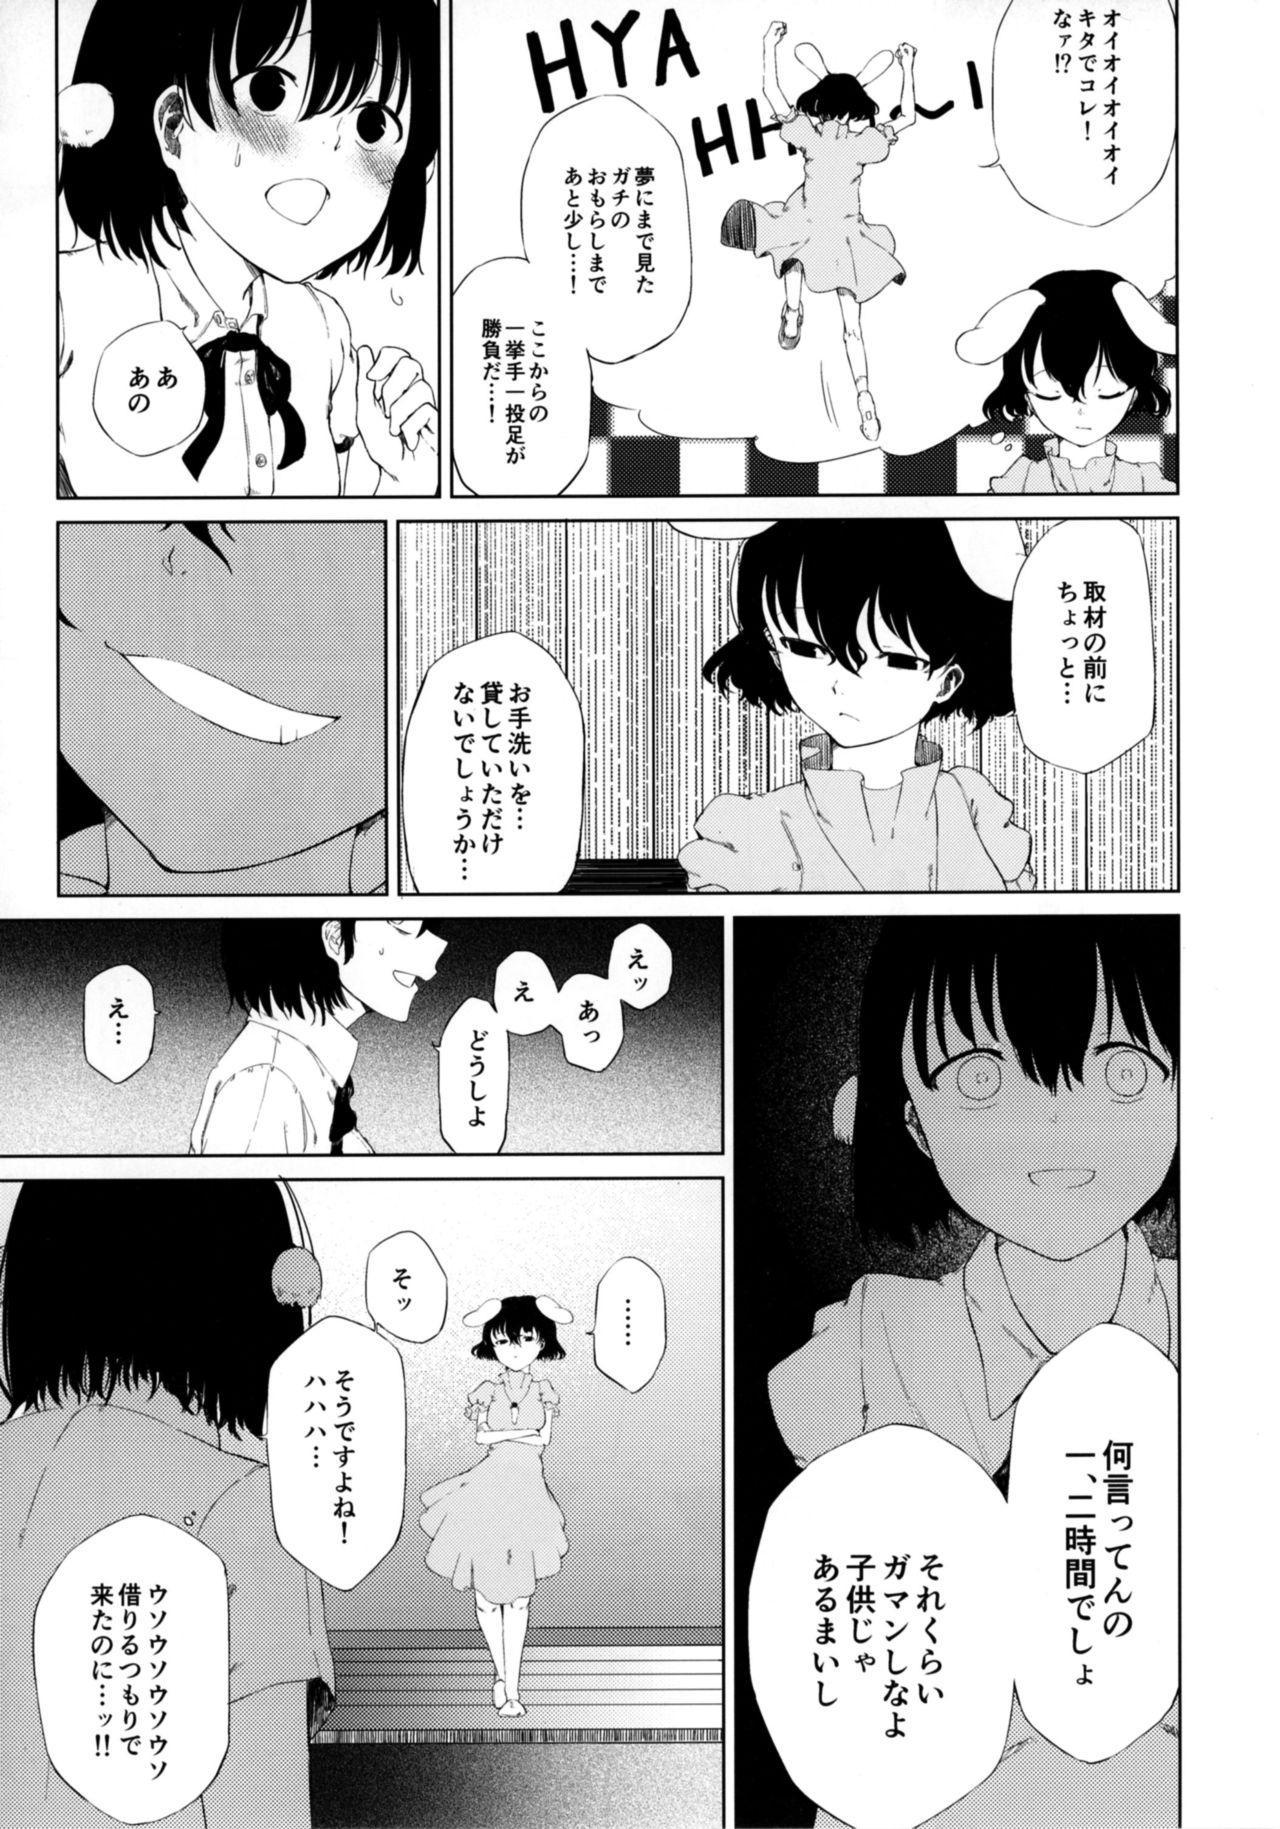 Aya to Tewi to Sanae to Udonge ga Omorashi Suru Hon!! 6